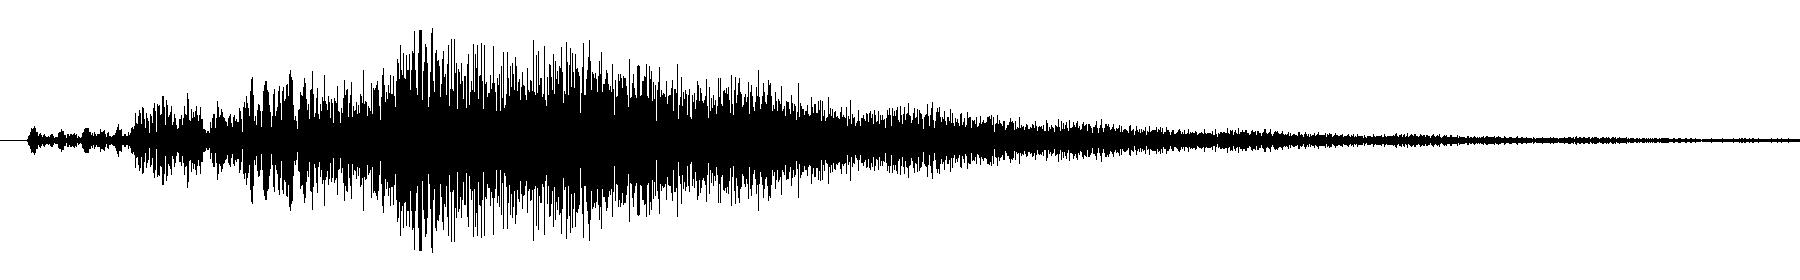 fx 01